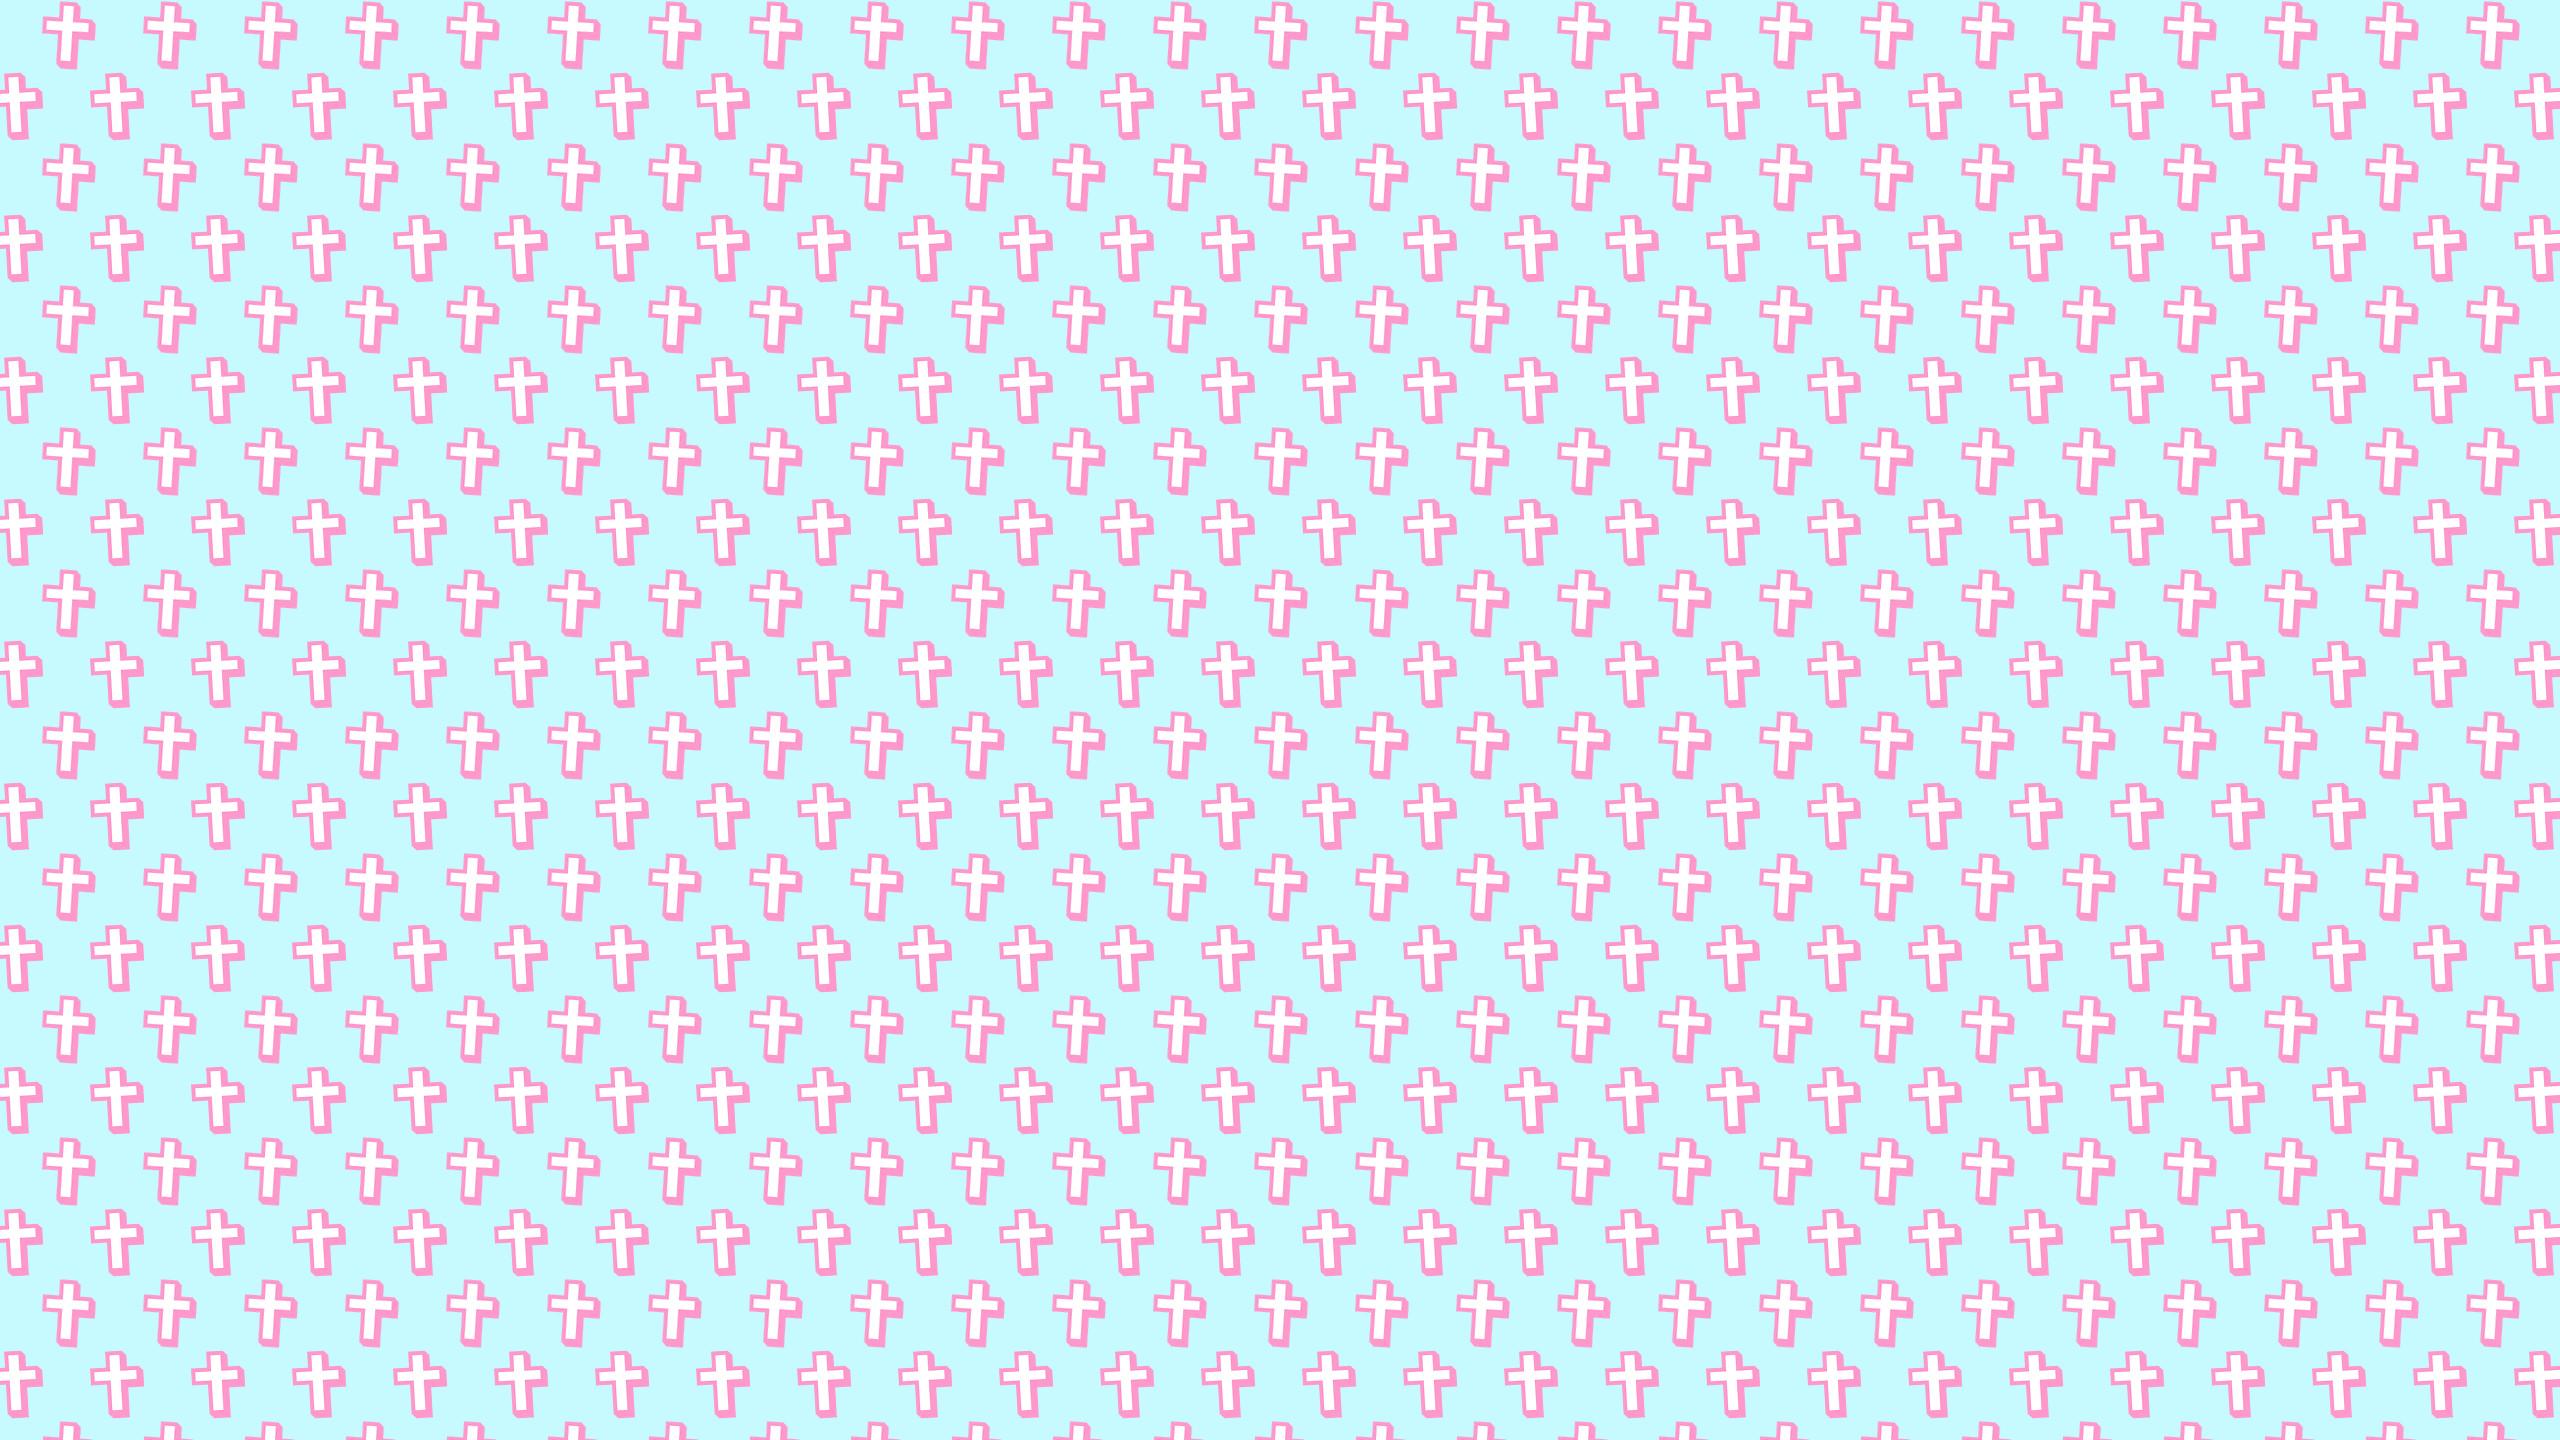 this Cute Crosses Desktop Wallpaper is easy. Just save the wallpaper .